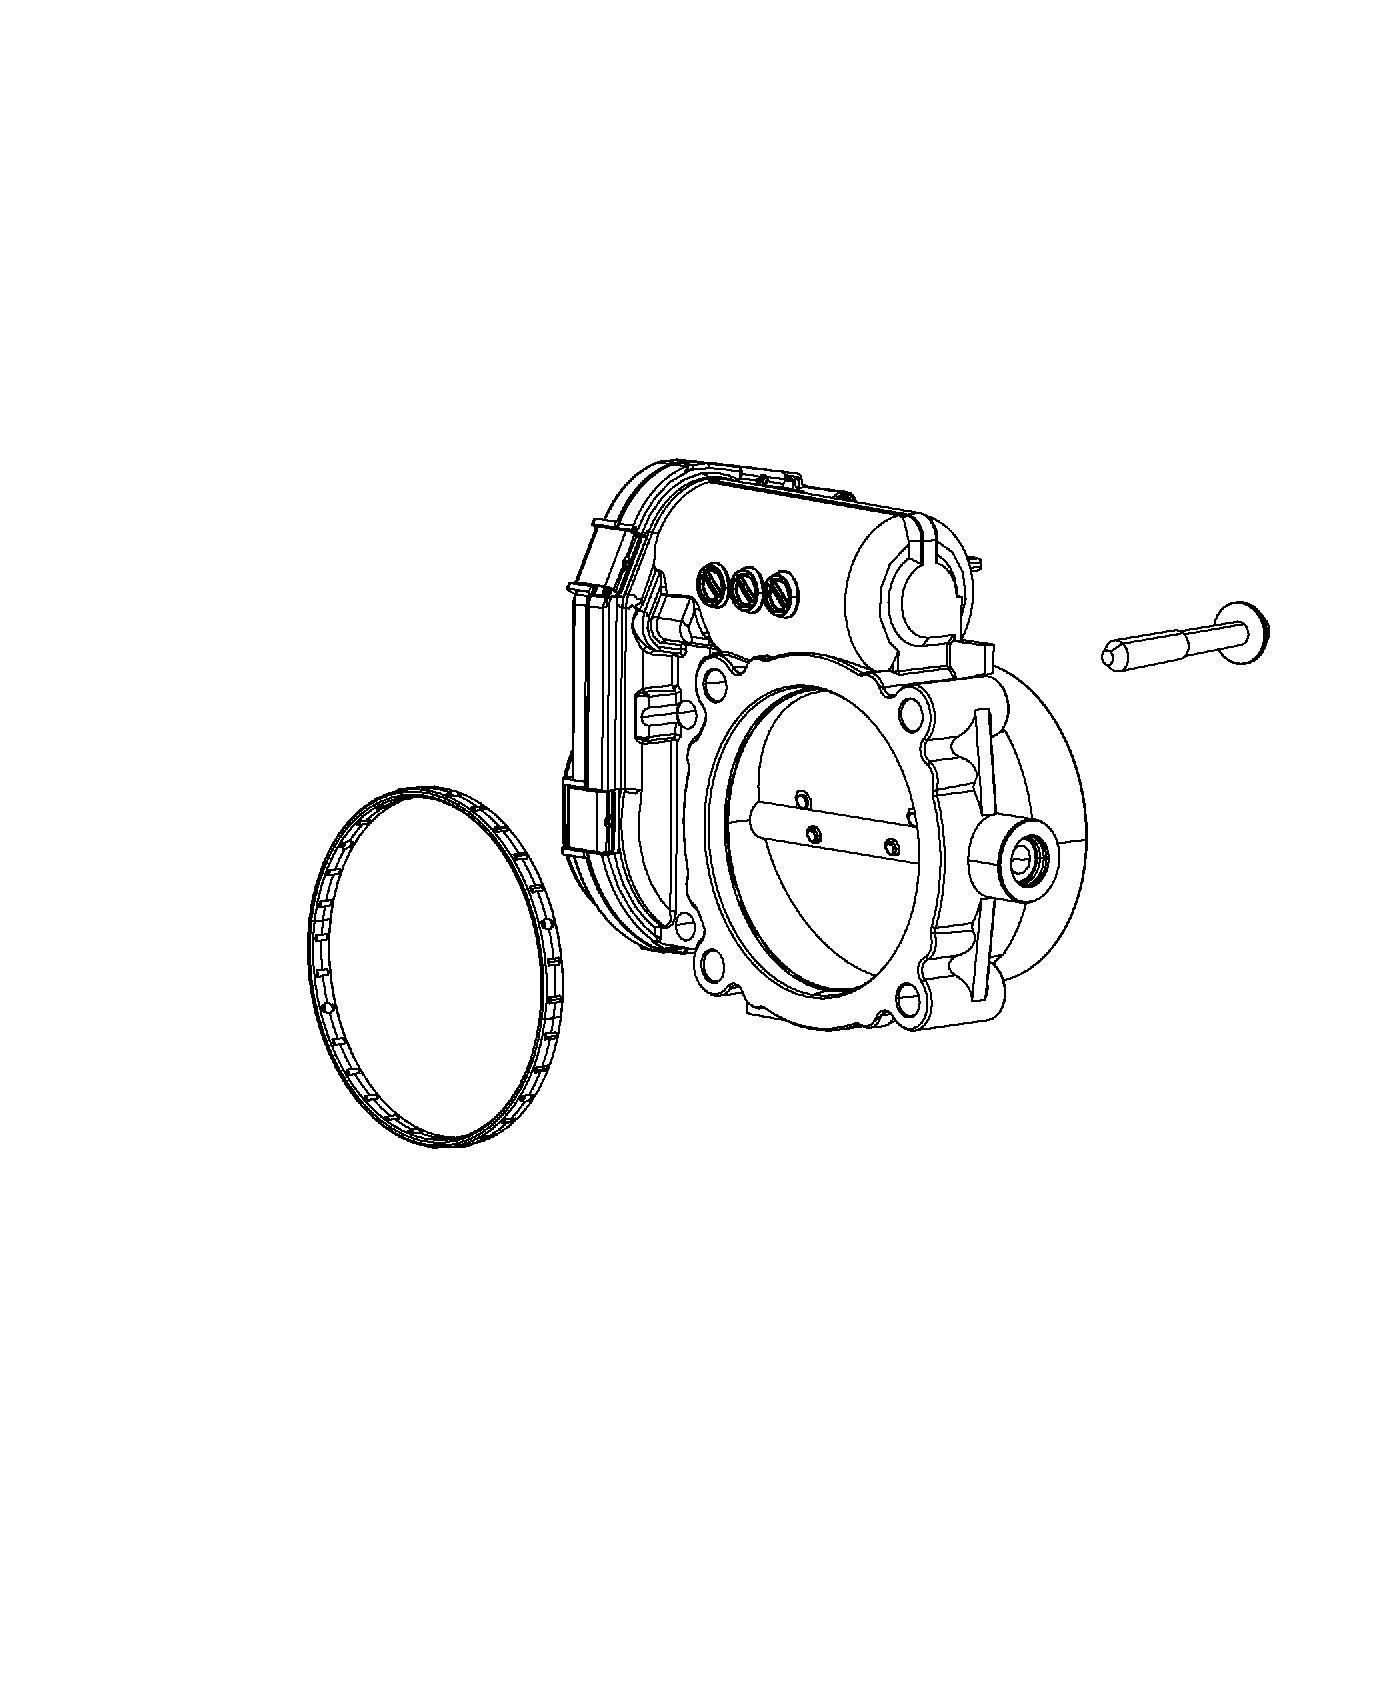 Ram Throttle Body 3 6l Mid V6 Engine